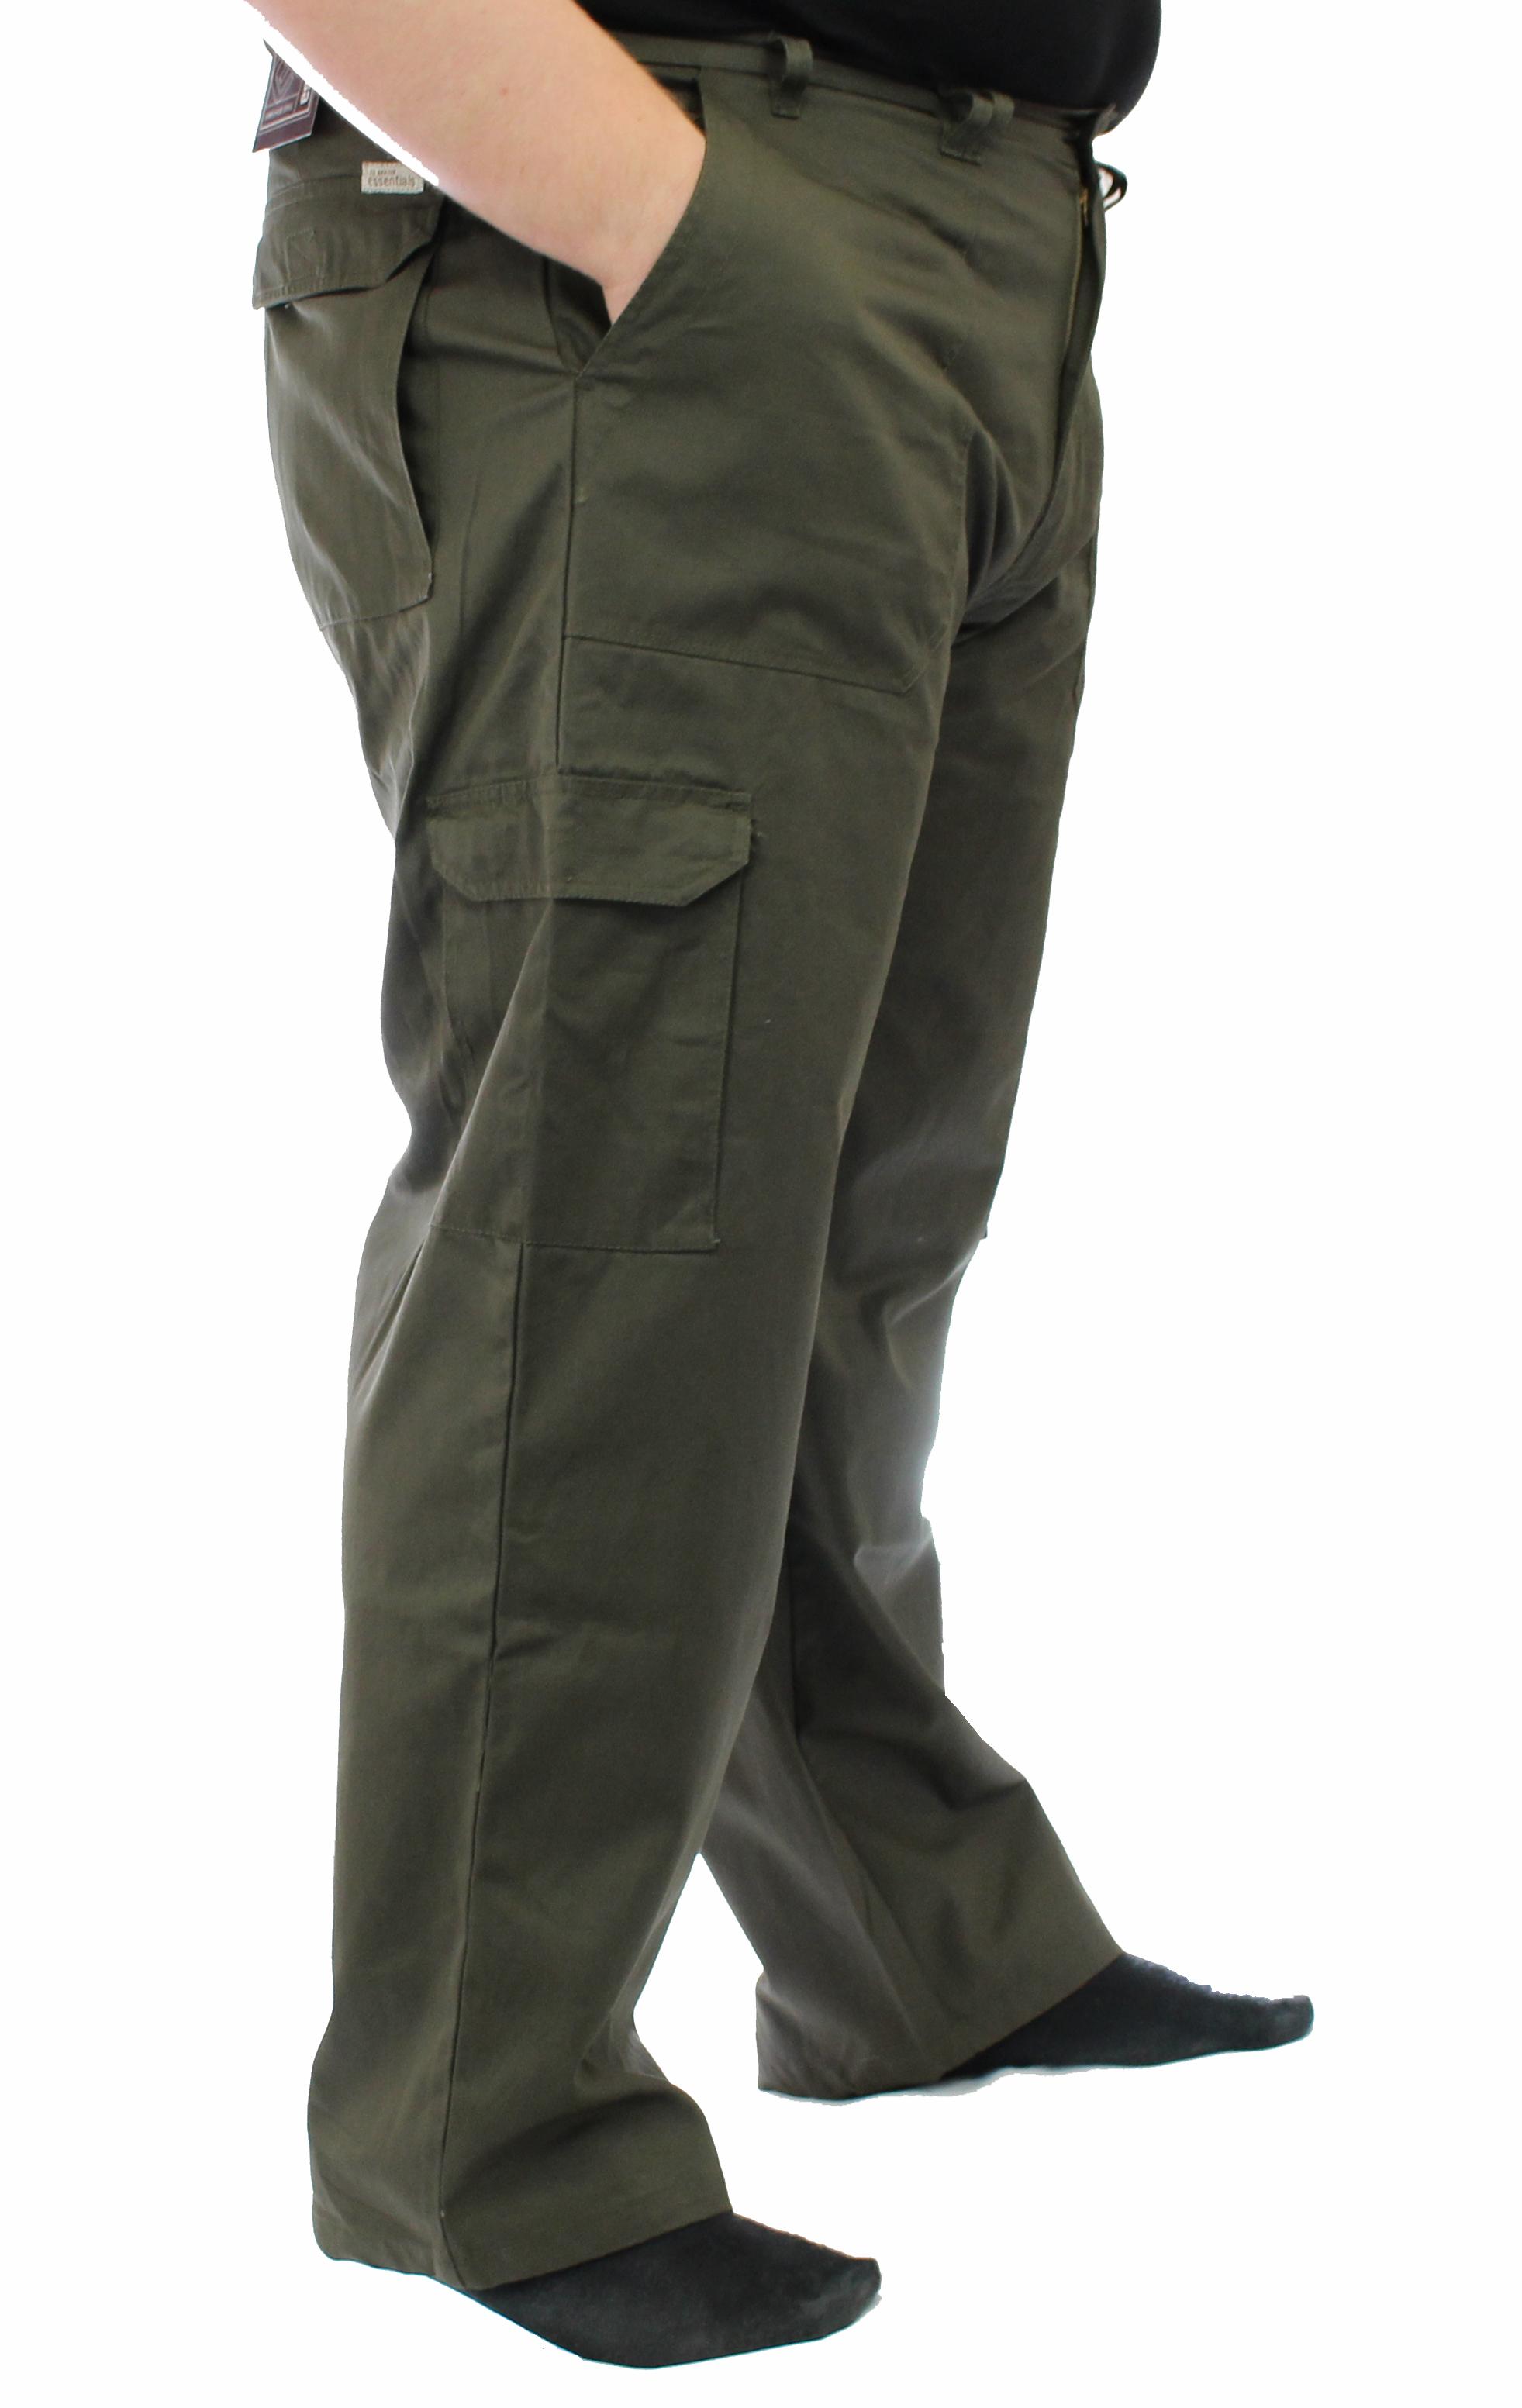 "Ed Baxter Victory - Heavy Duty Cargo Combat Trousers - Khaki - 54"" Waist, 30"" Leg"